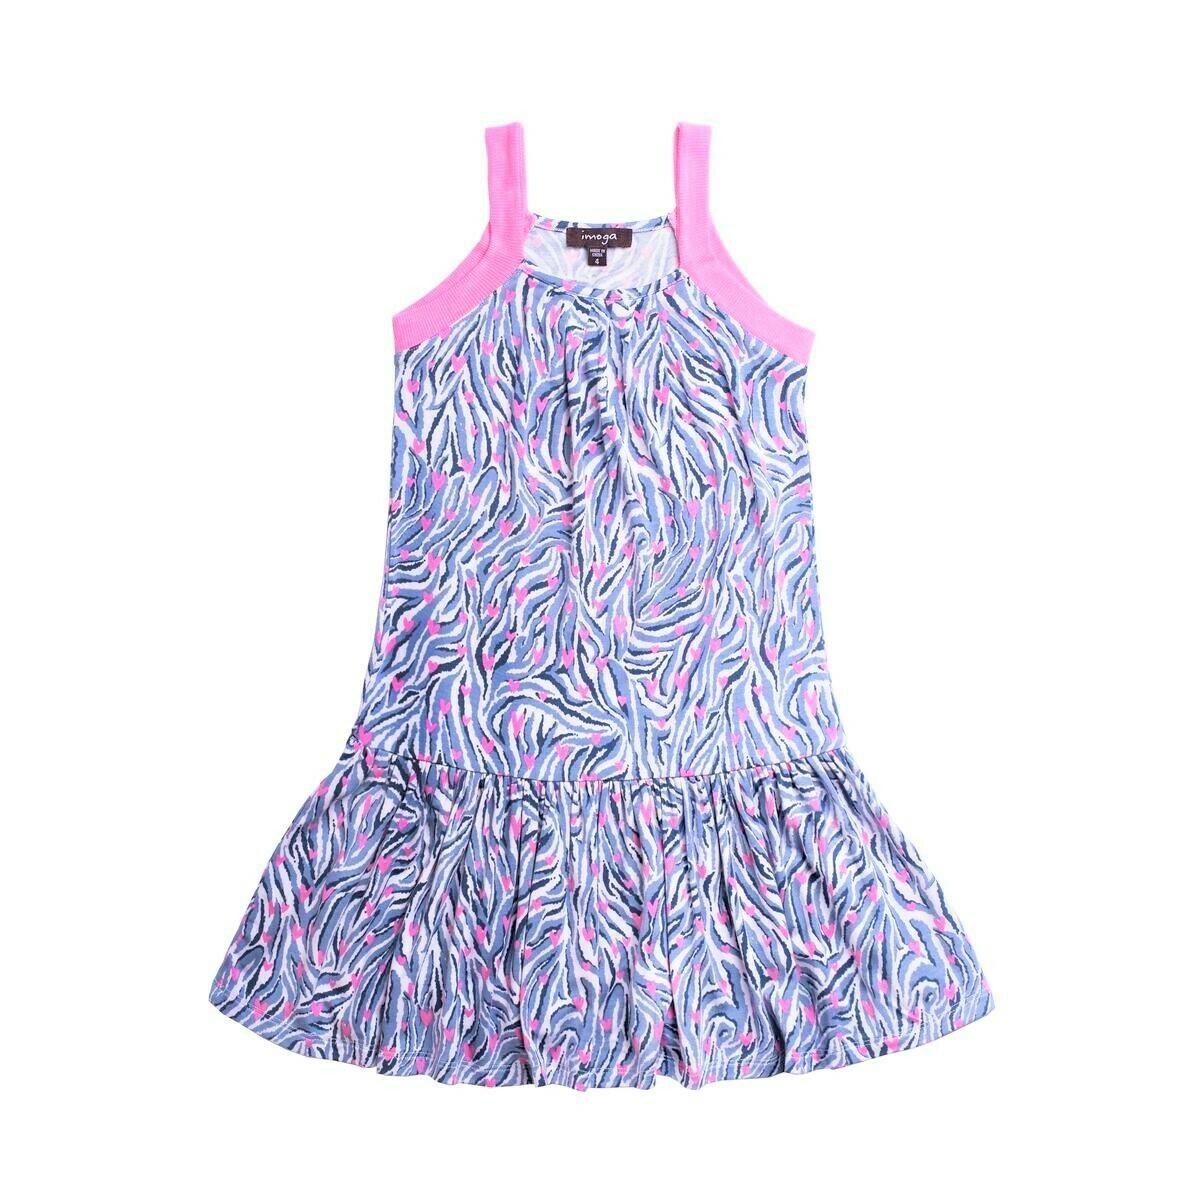 Imoga Savanna Sydney Girls Dress